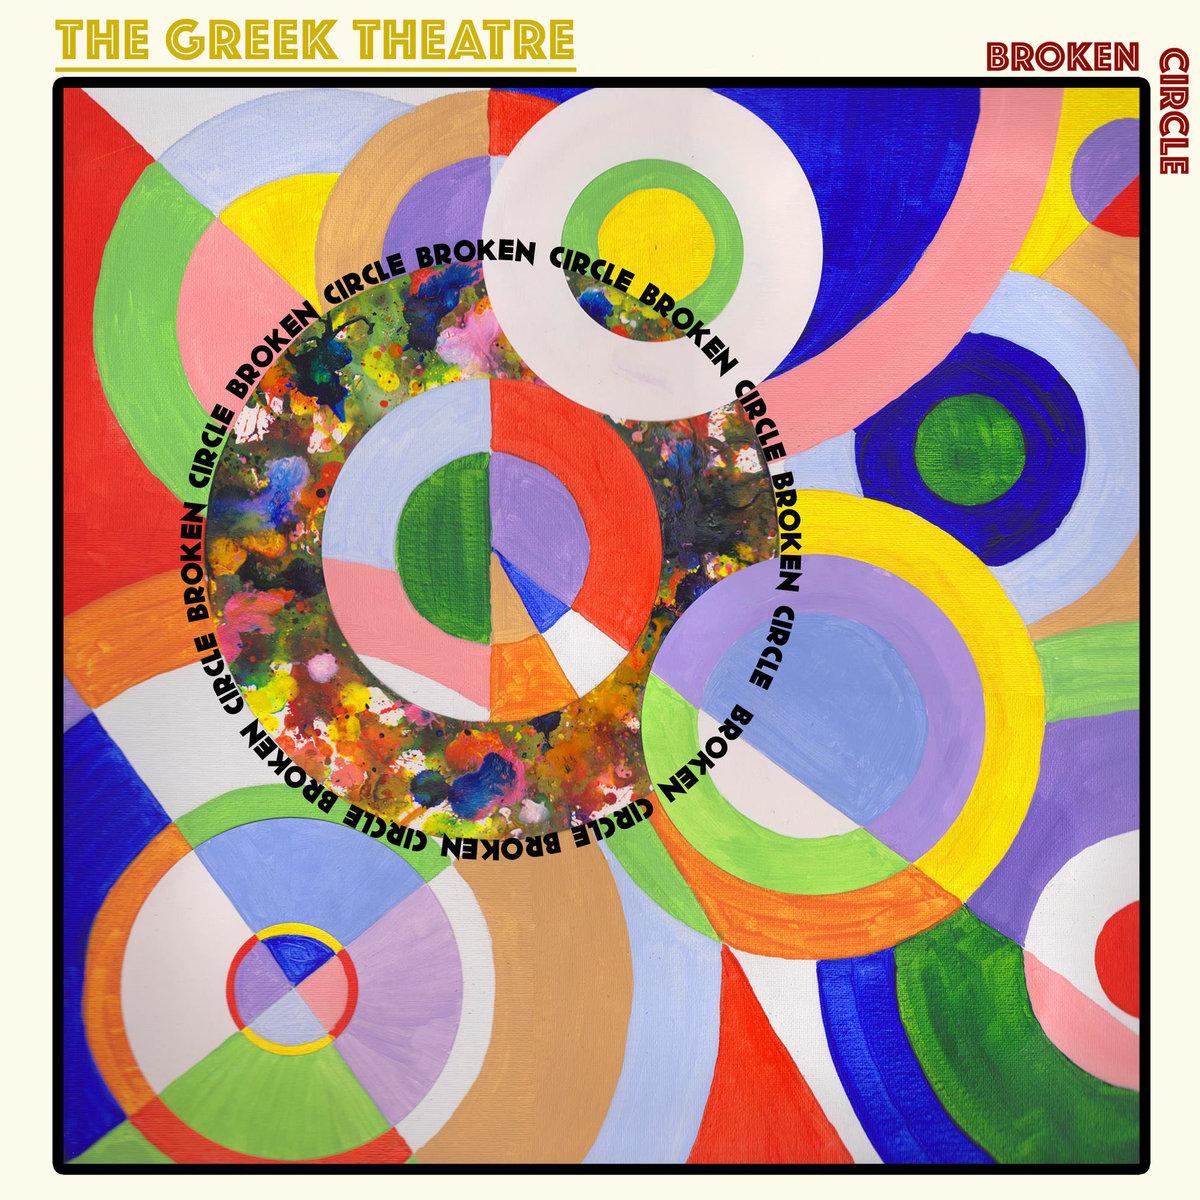 the greek theatre broken circle